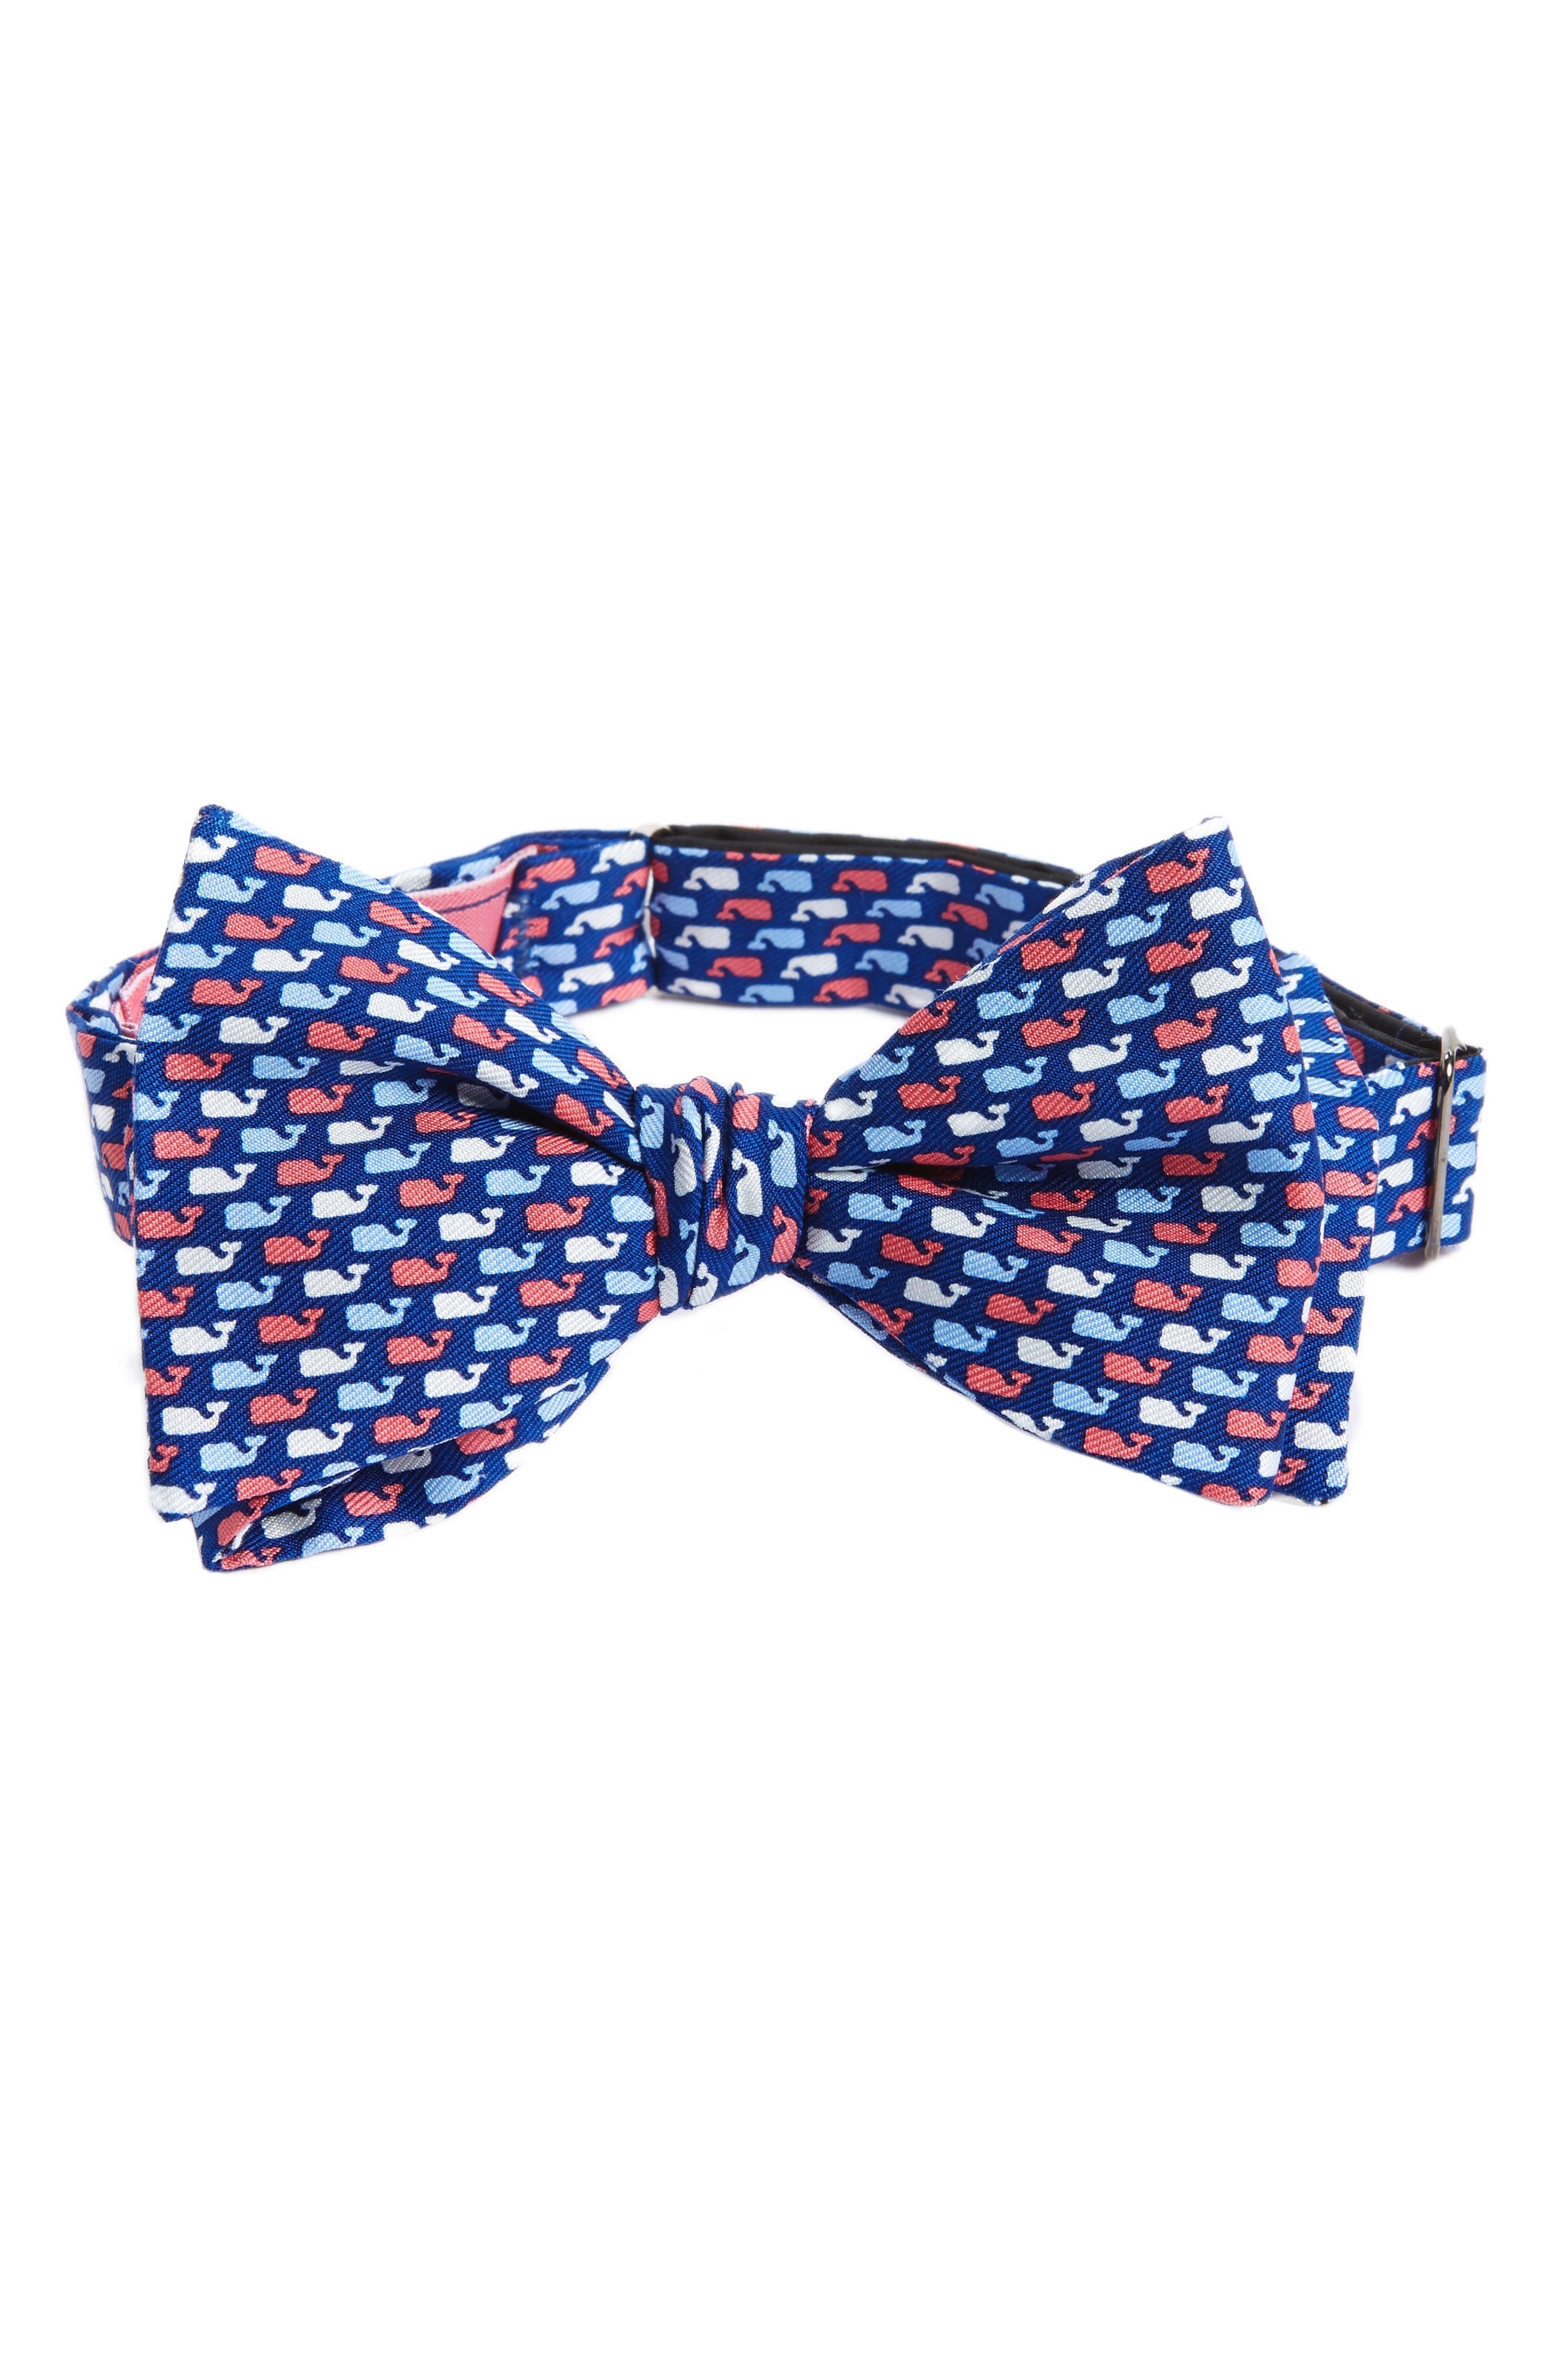 VINEYARD VINES Red White & Whale Silk Bow Tie